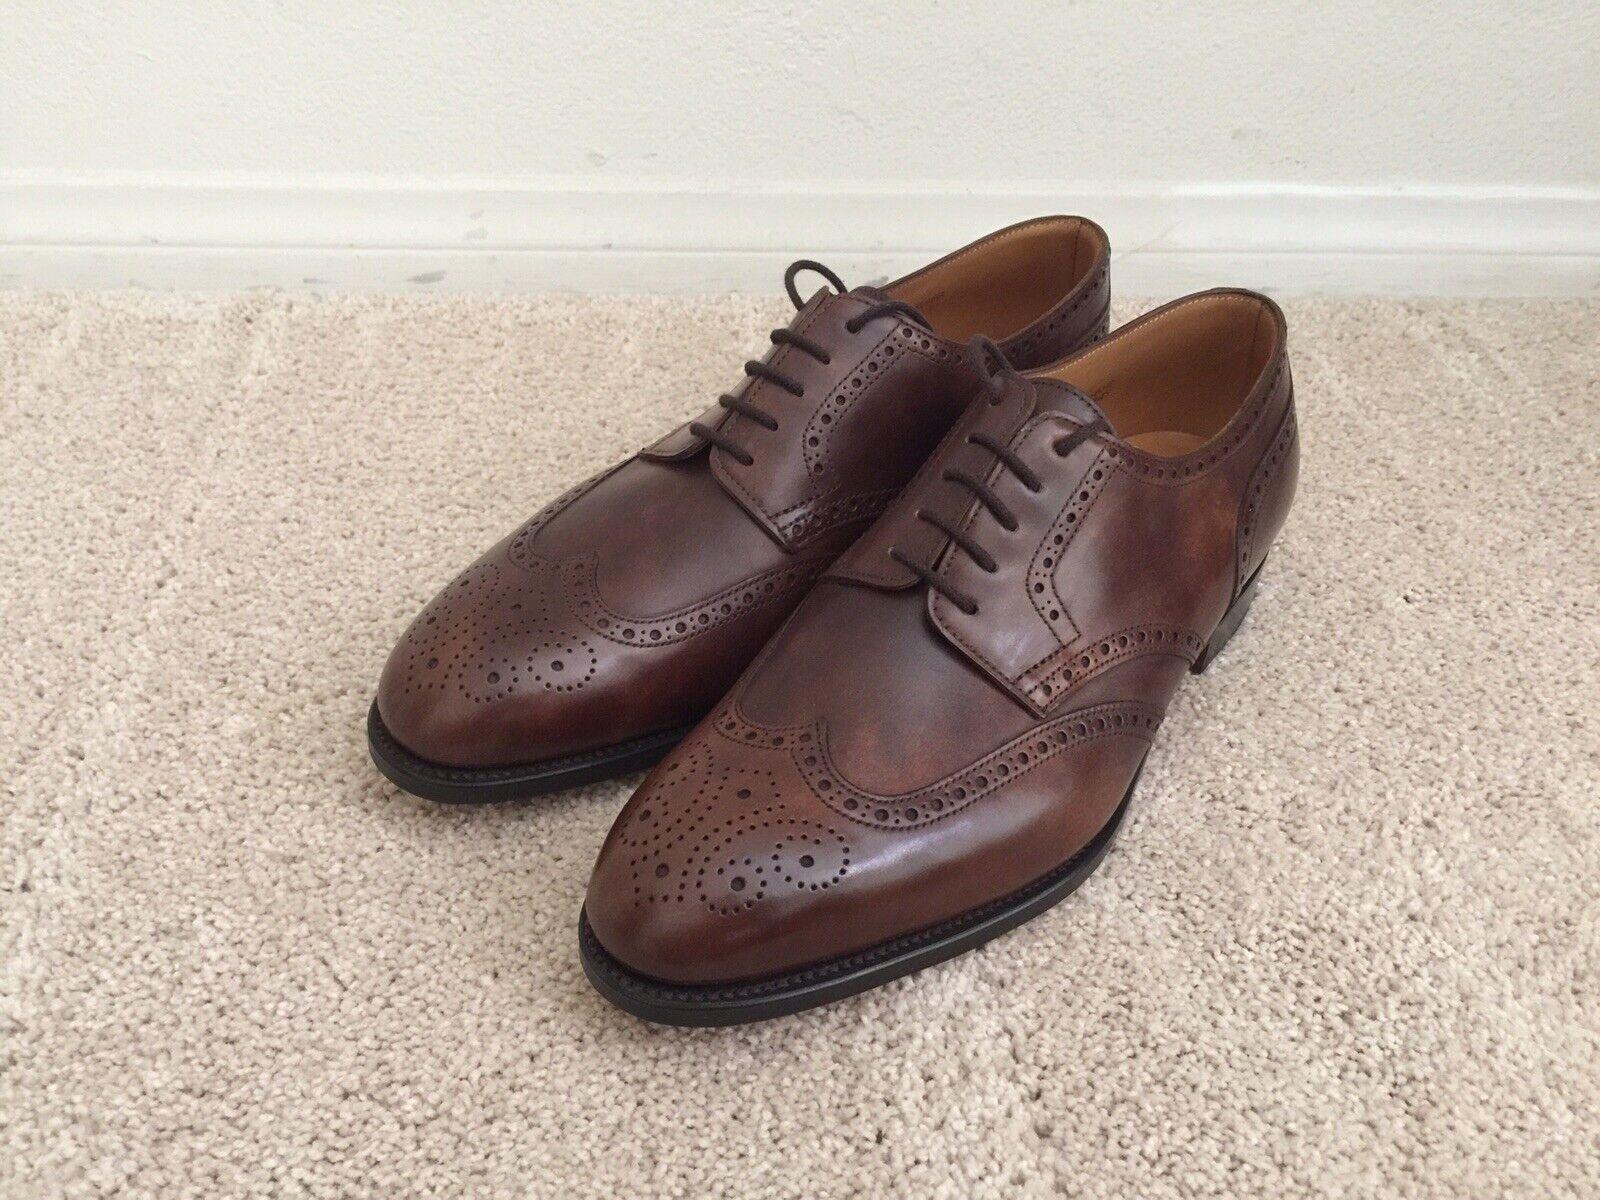 John Lobb Darby II Sz. 7 E Parisian Brown Museum Calf Dress shoes bluetcher